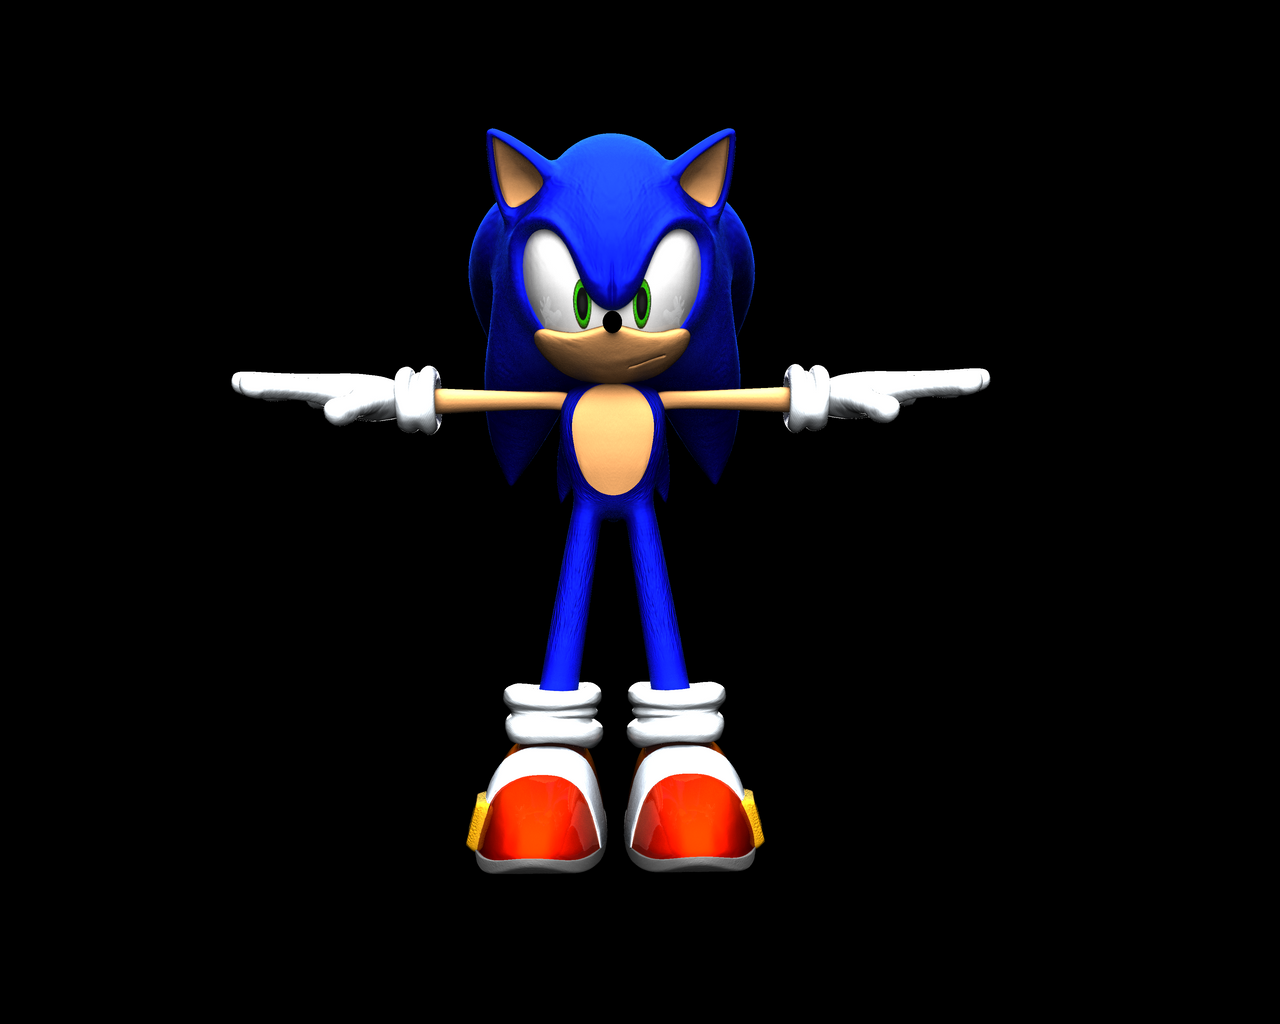 Sonic 3d model update by nothing111111 on deviantart for Deviantart 3d models